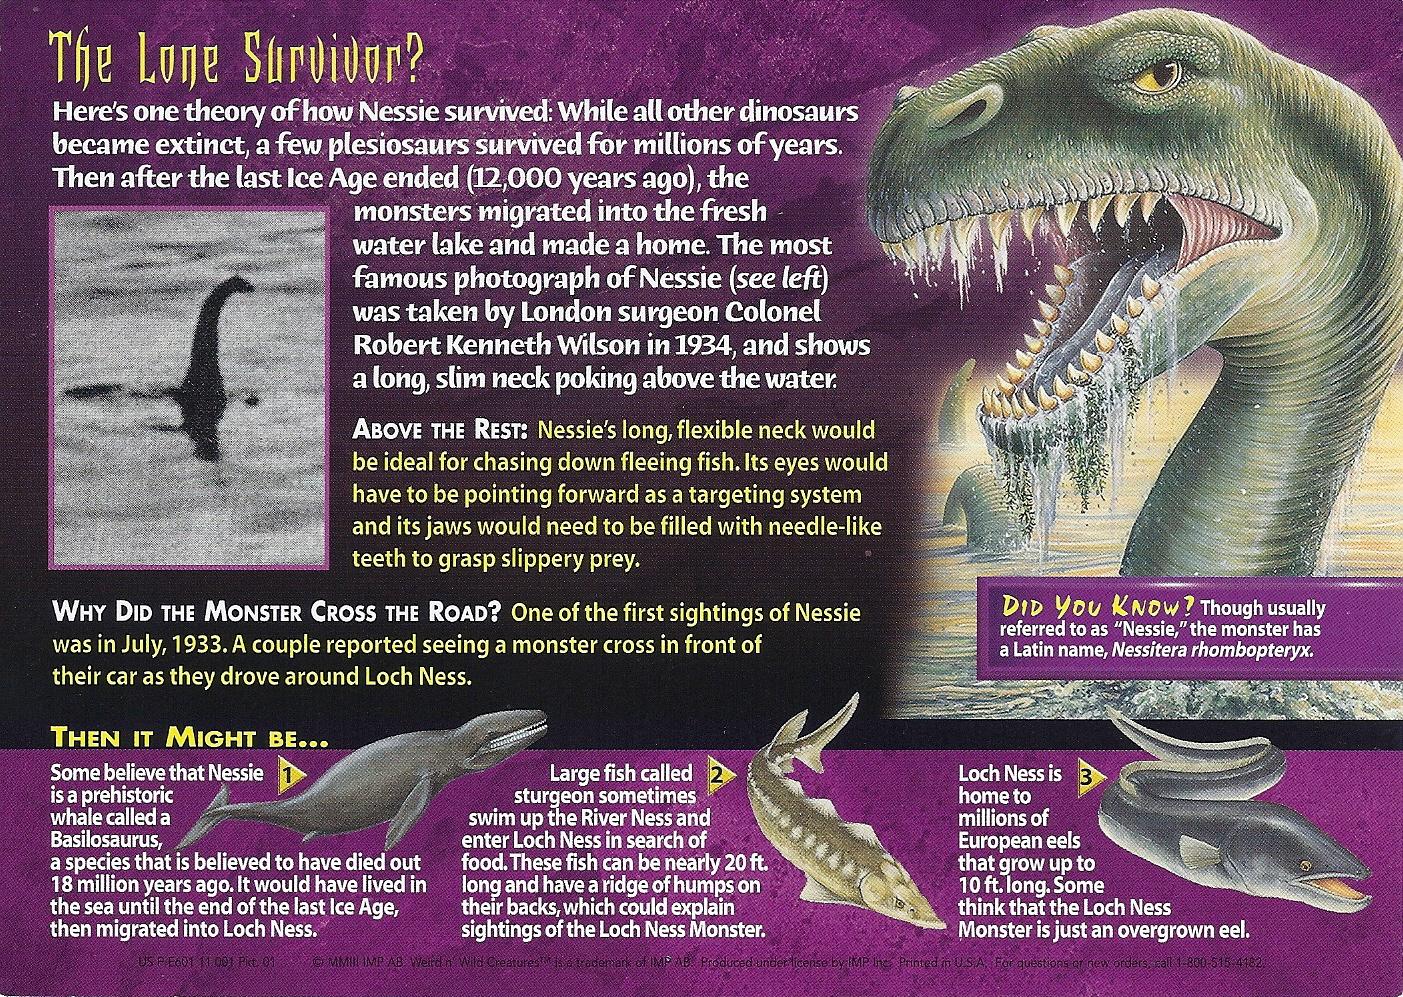 Lochness Monster Revealed Man Captures Dinosaur Creature